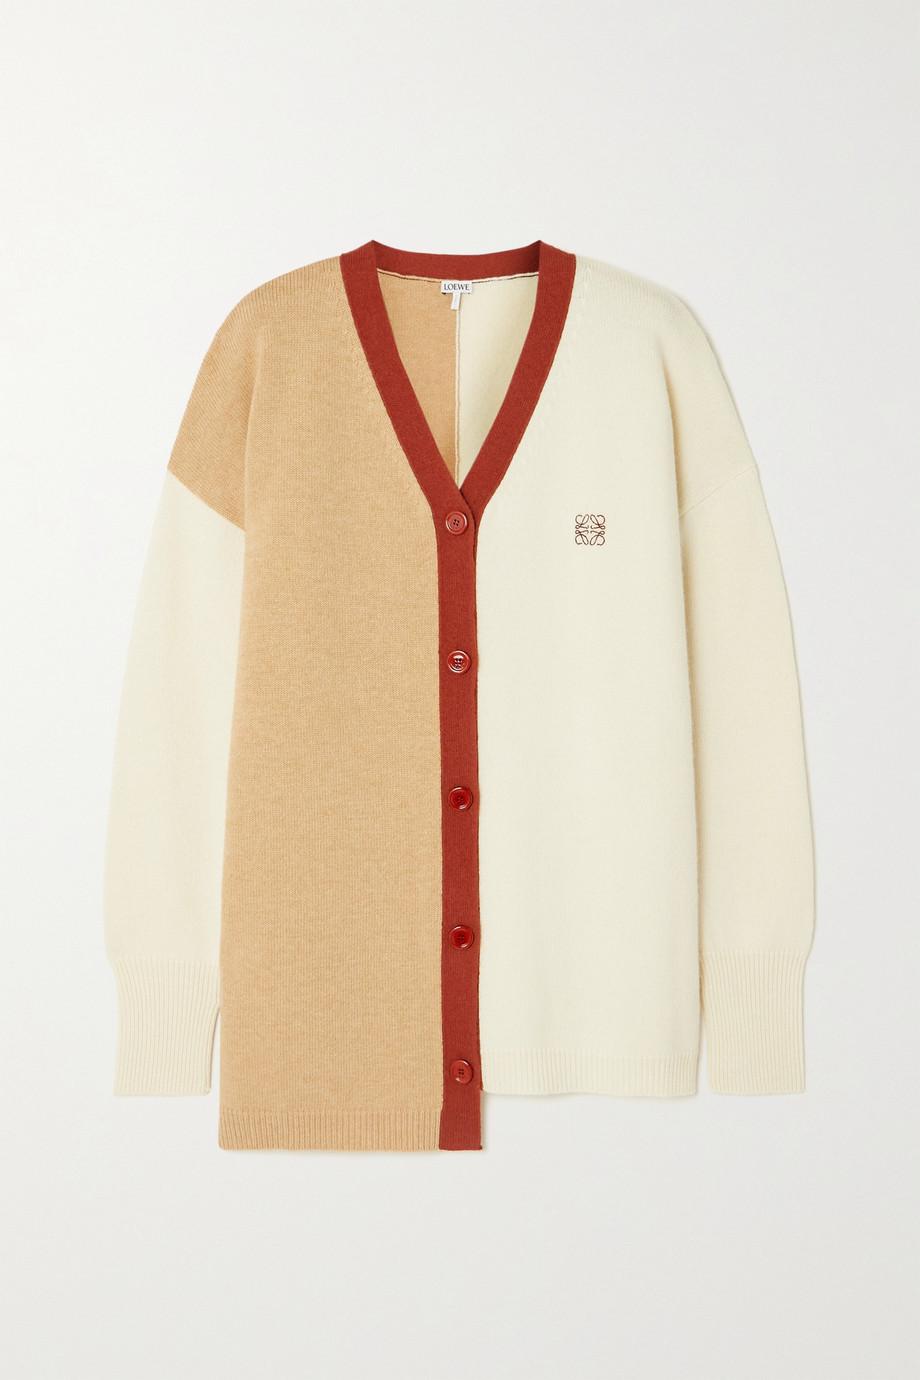 Loewe Asymmetric embroidered color-block wool cardigan